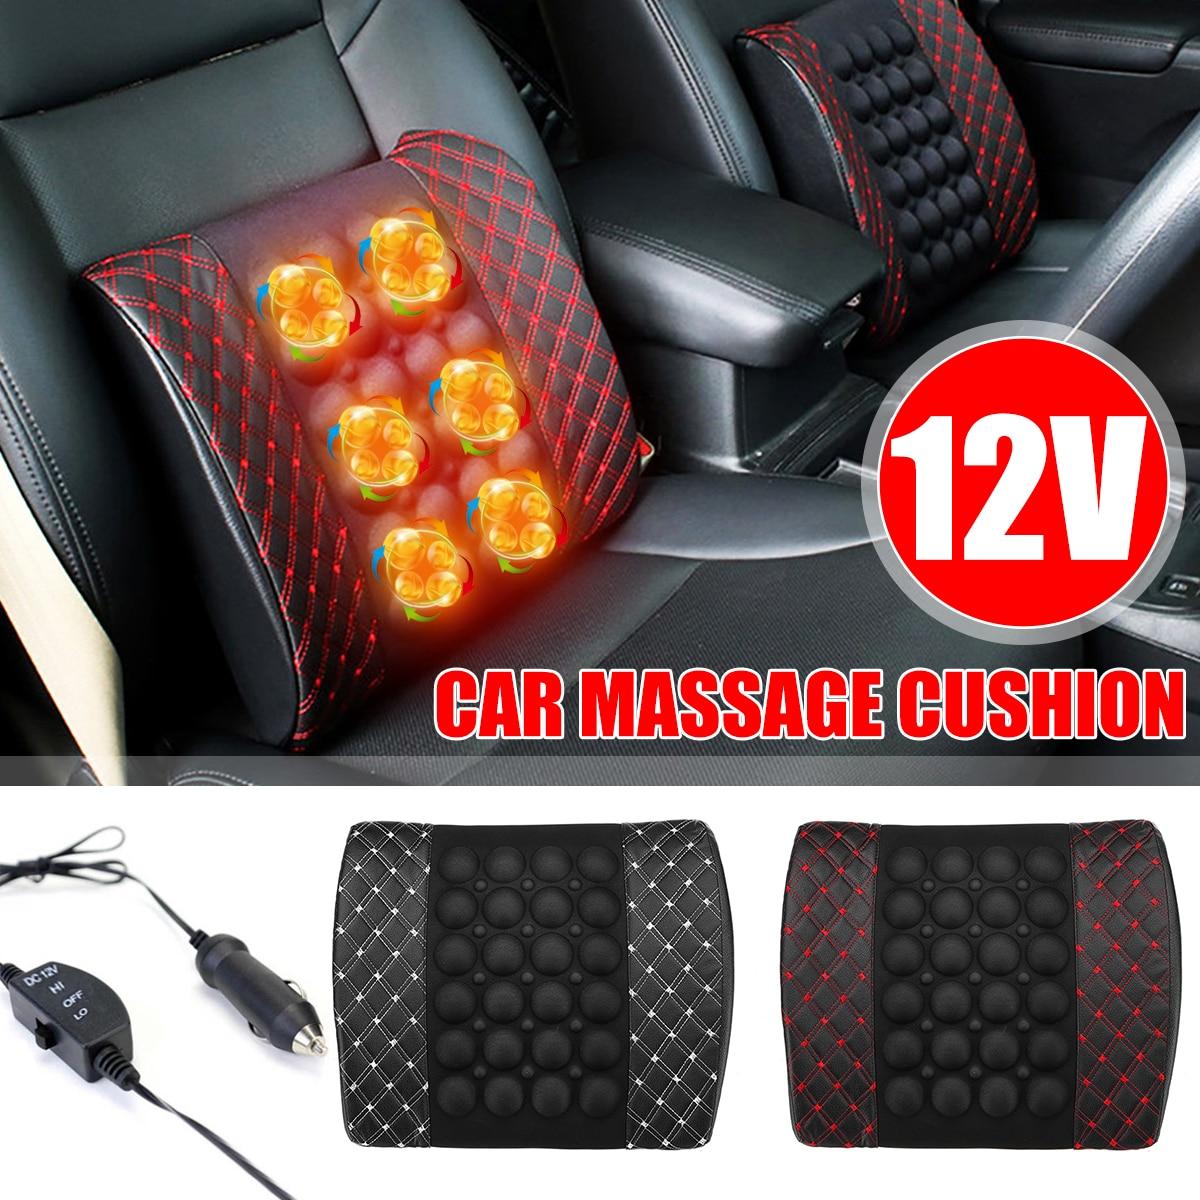 12V voiture Massage lombaire coussin voiture électrique Massage coussin lombaire Massage siège de voiture dos coussin taille soutien